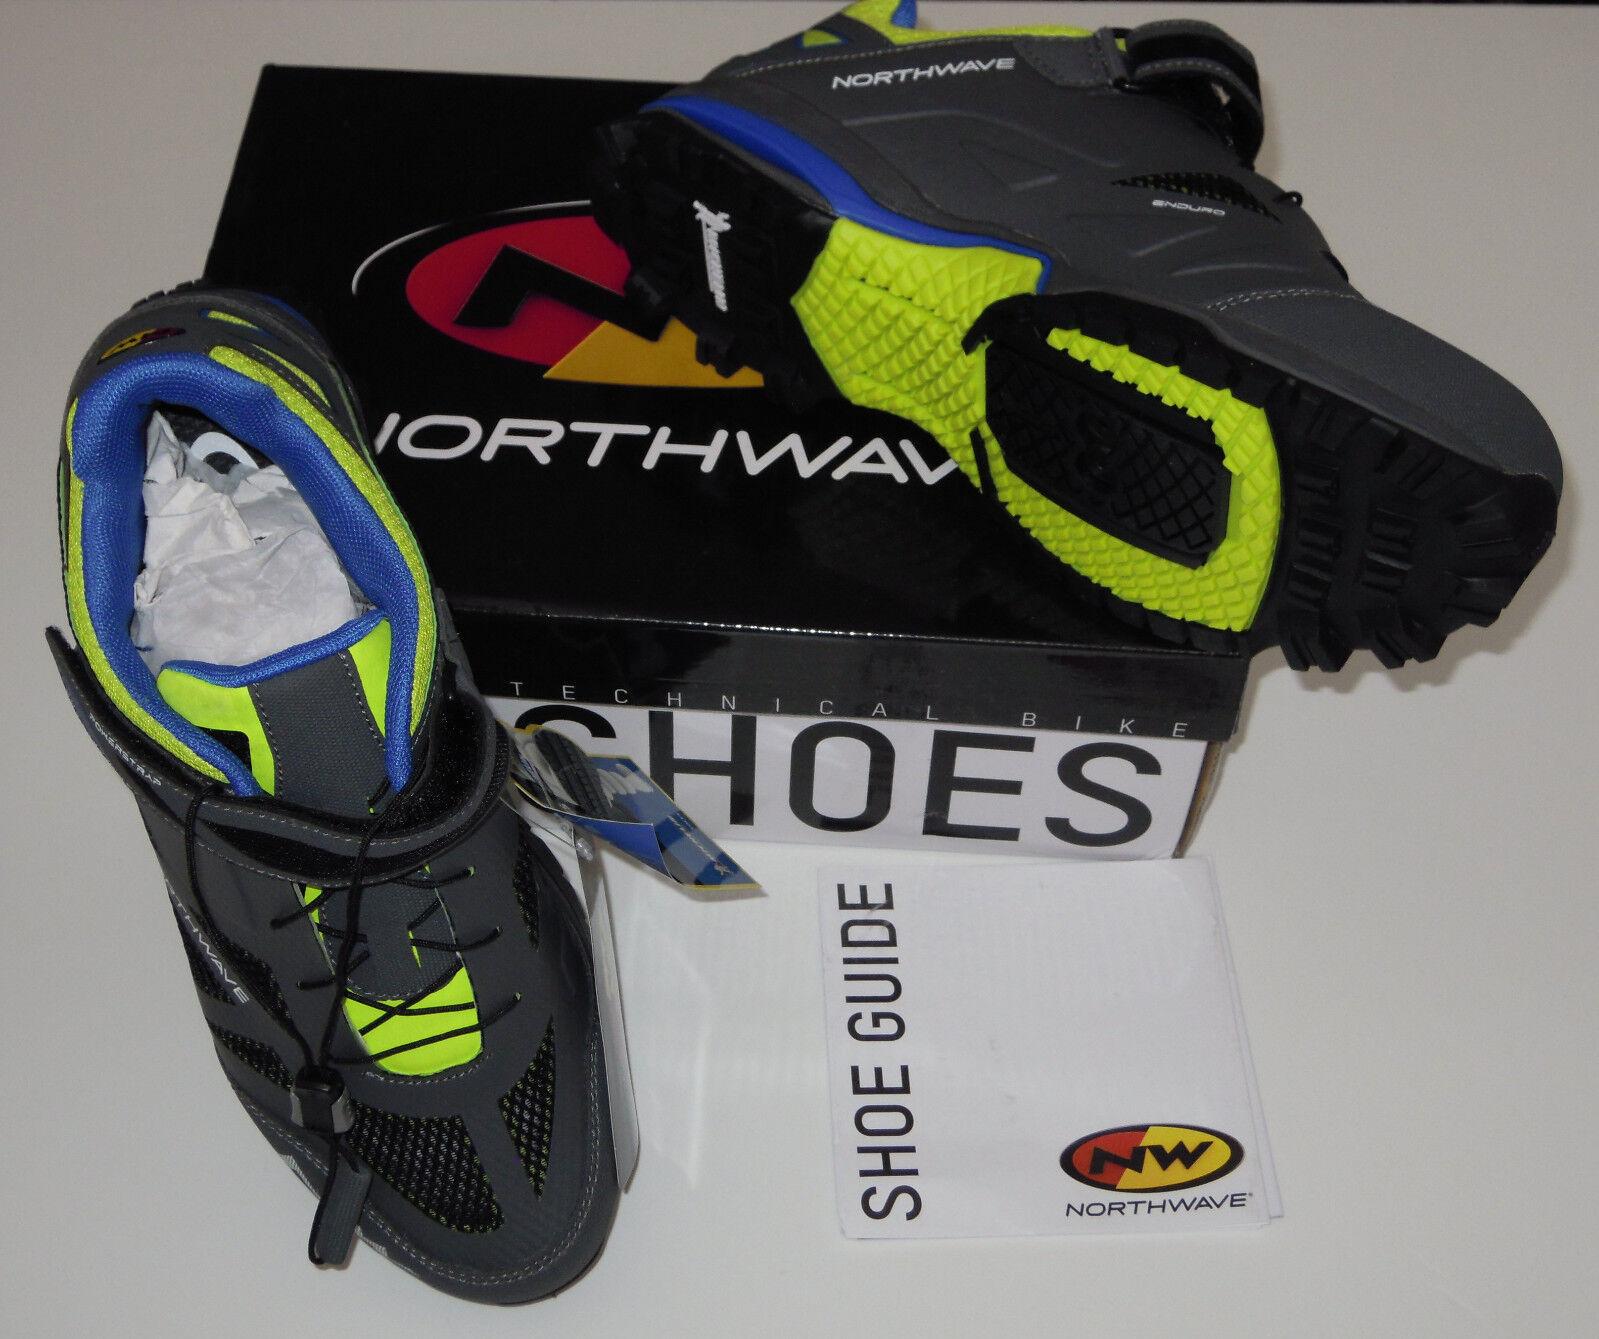 Northwave - skor Original Northwave x MTB Modell Enduro Freeride SPD Box-Ny